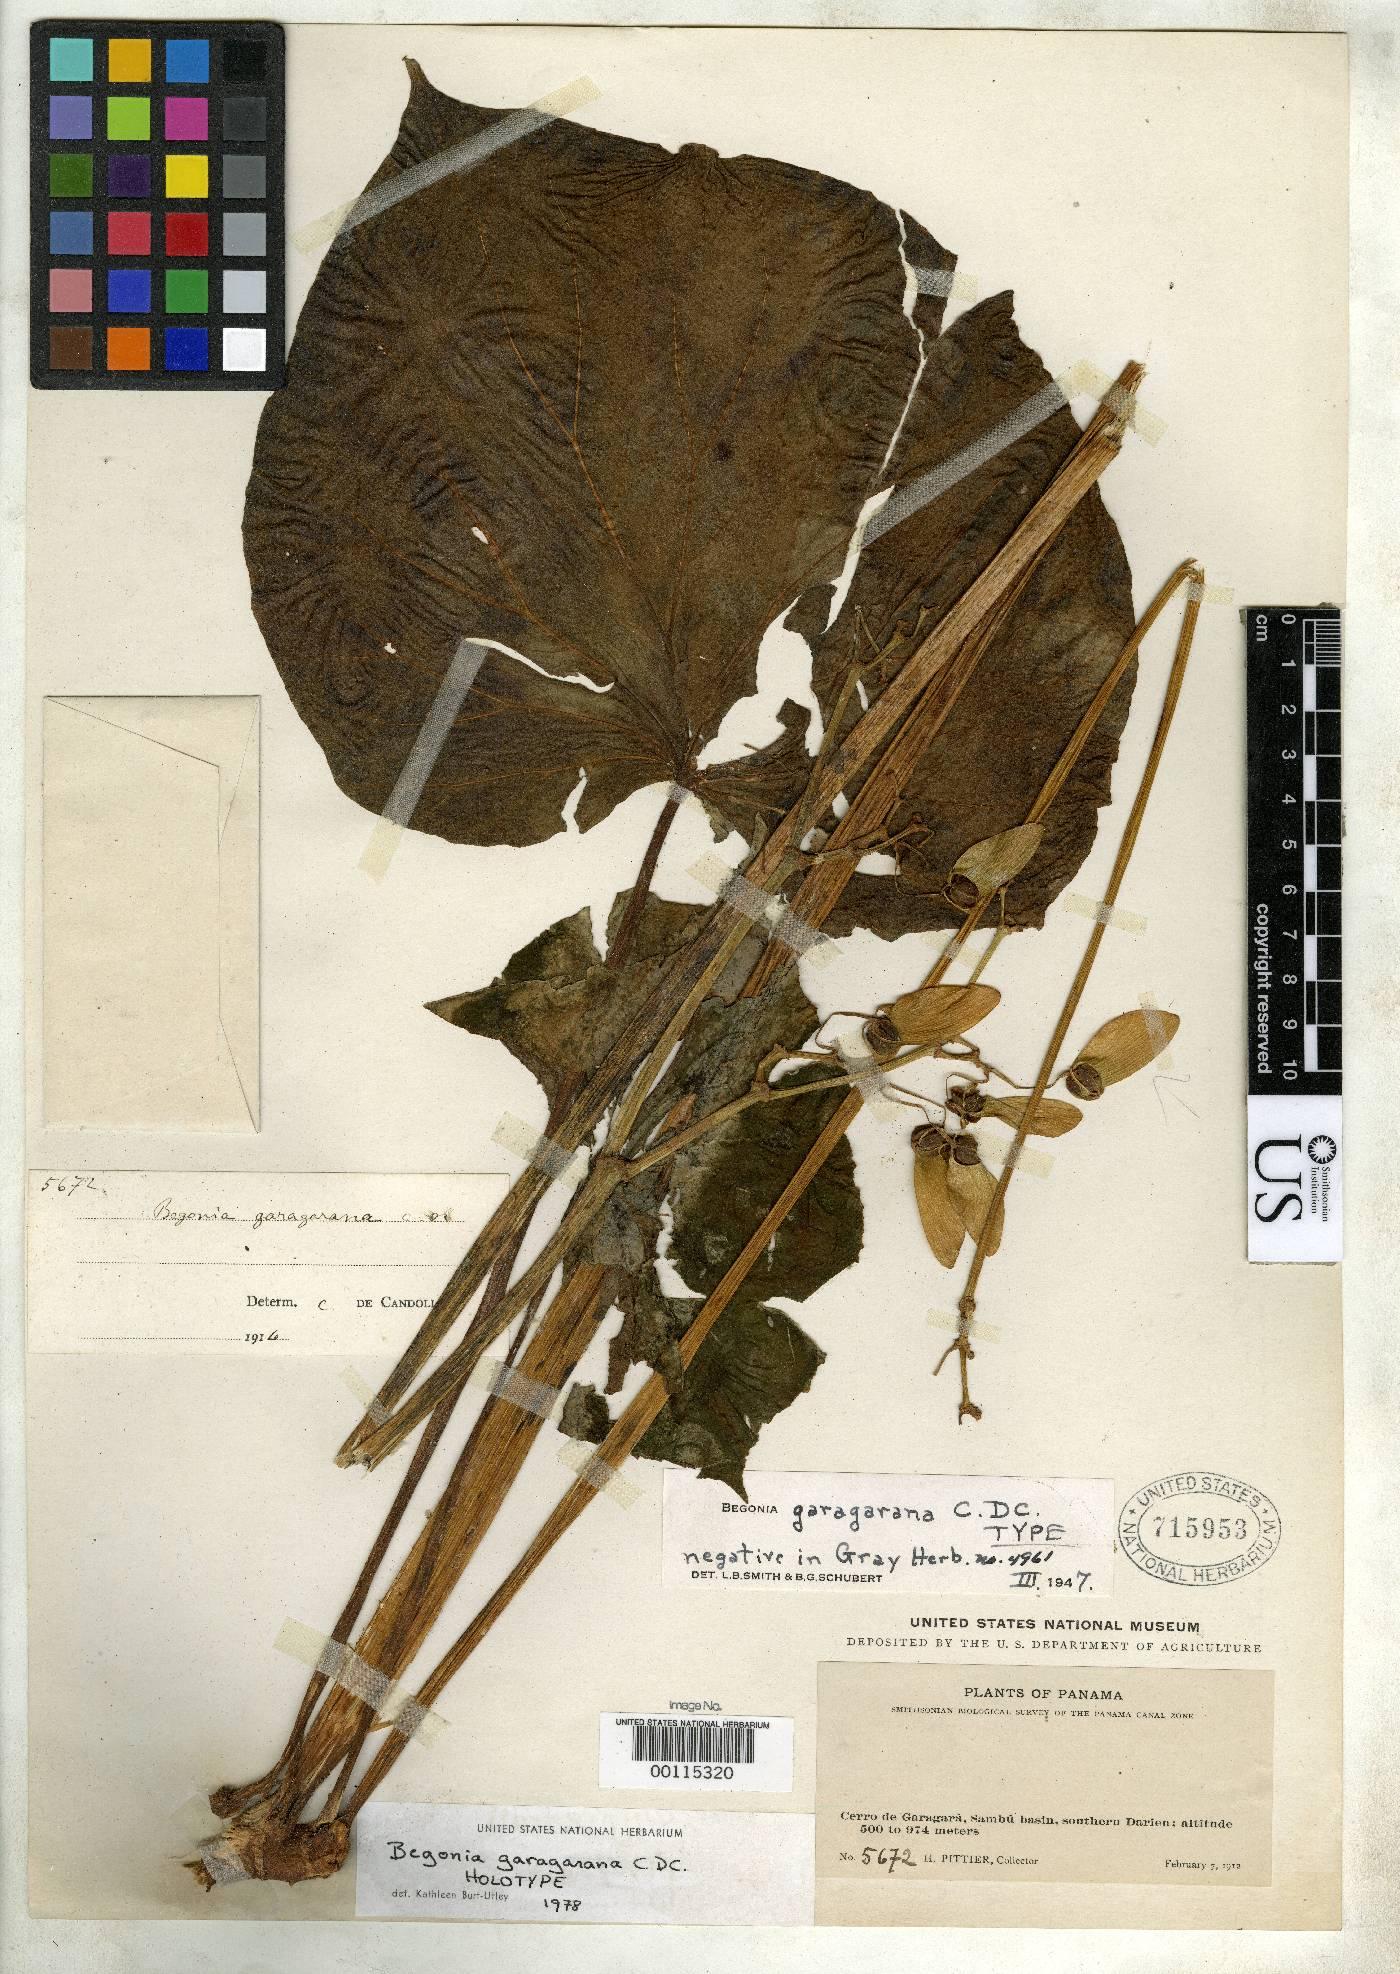 Begonia garagarana image